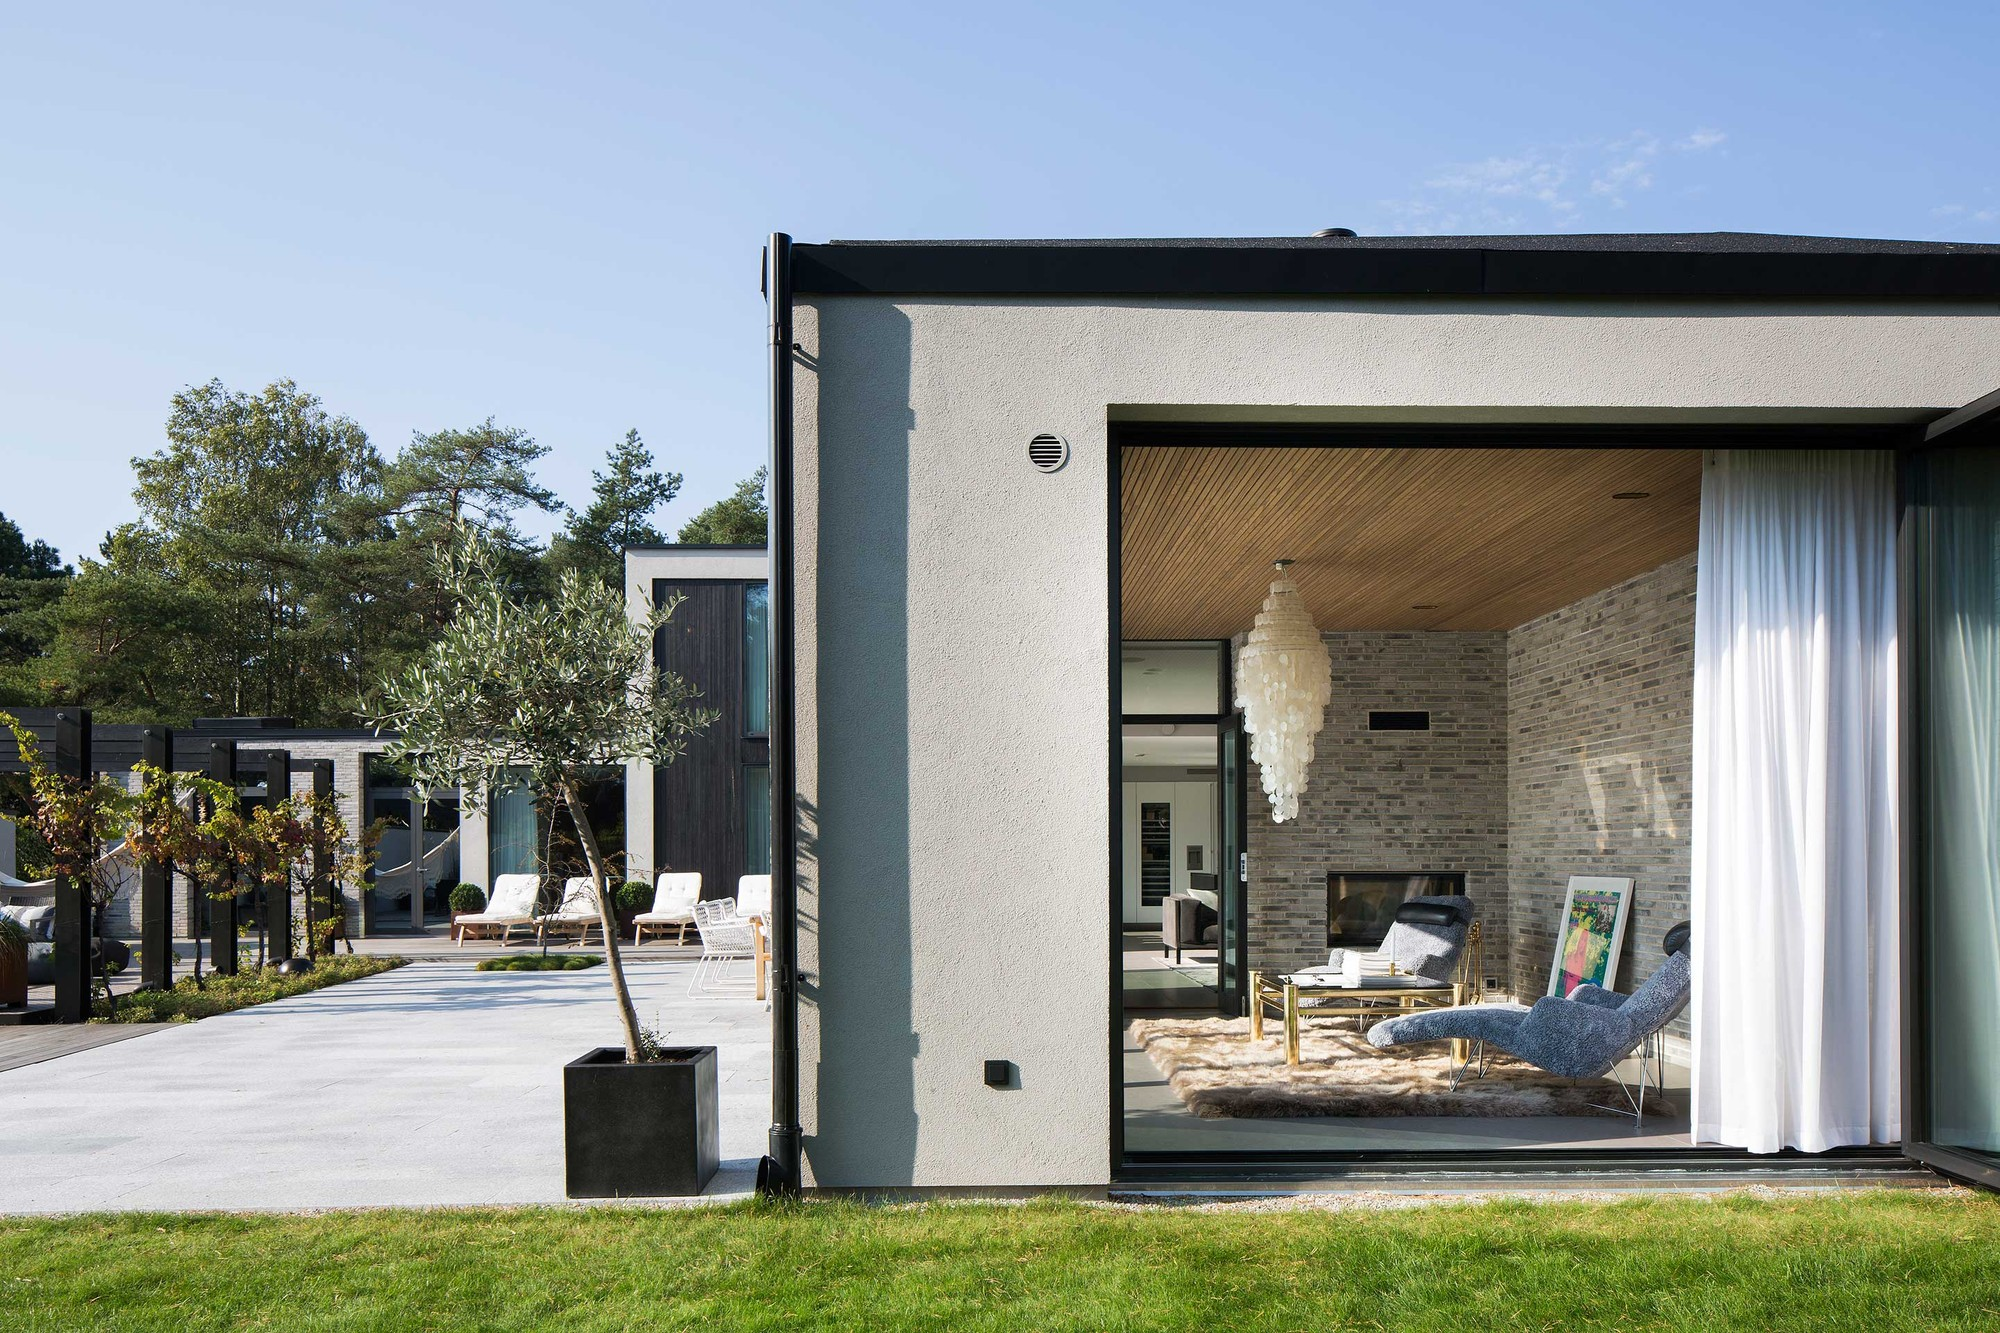 Residência J / Johan Sundberg, © Markus Linderoth